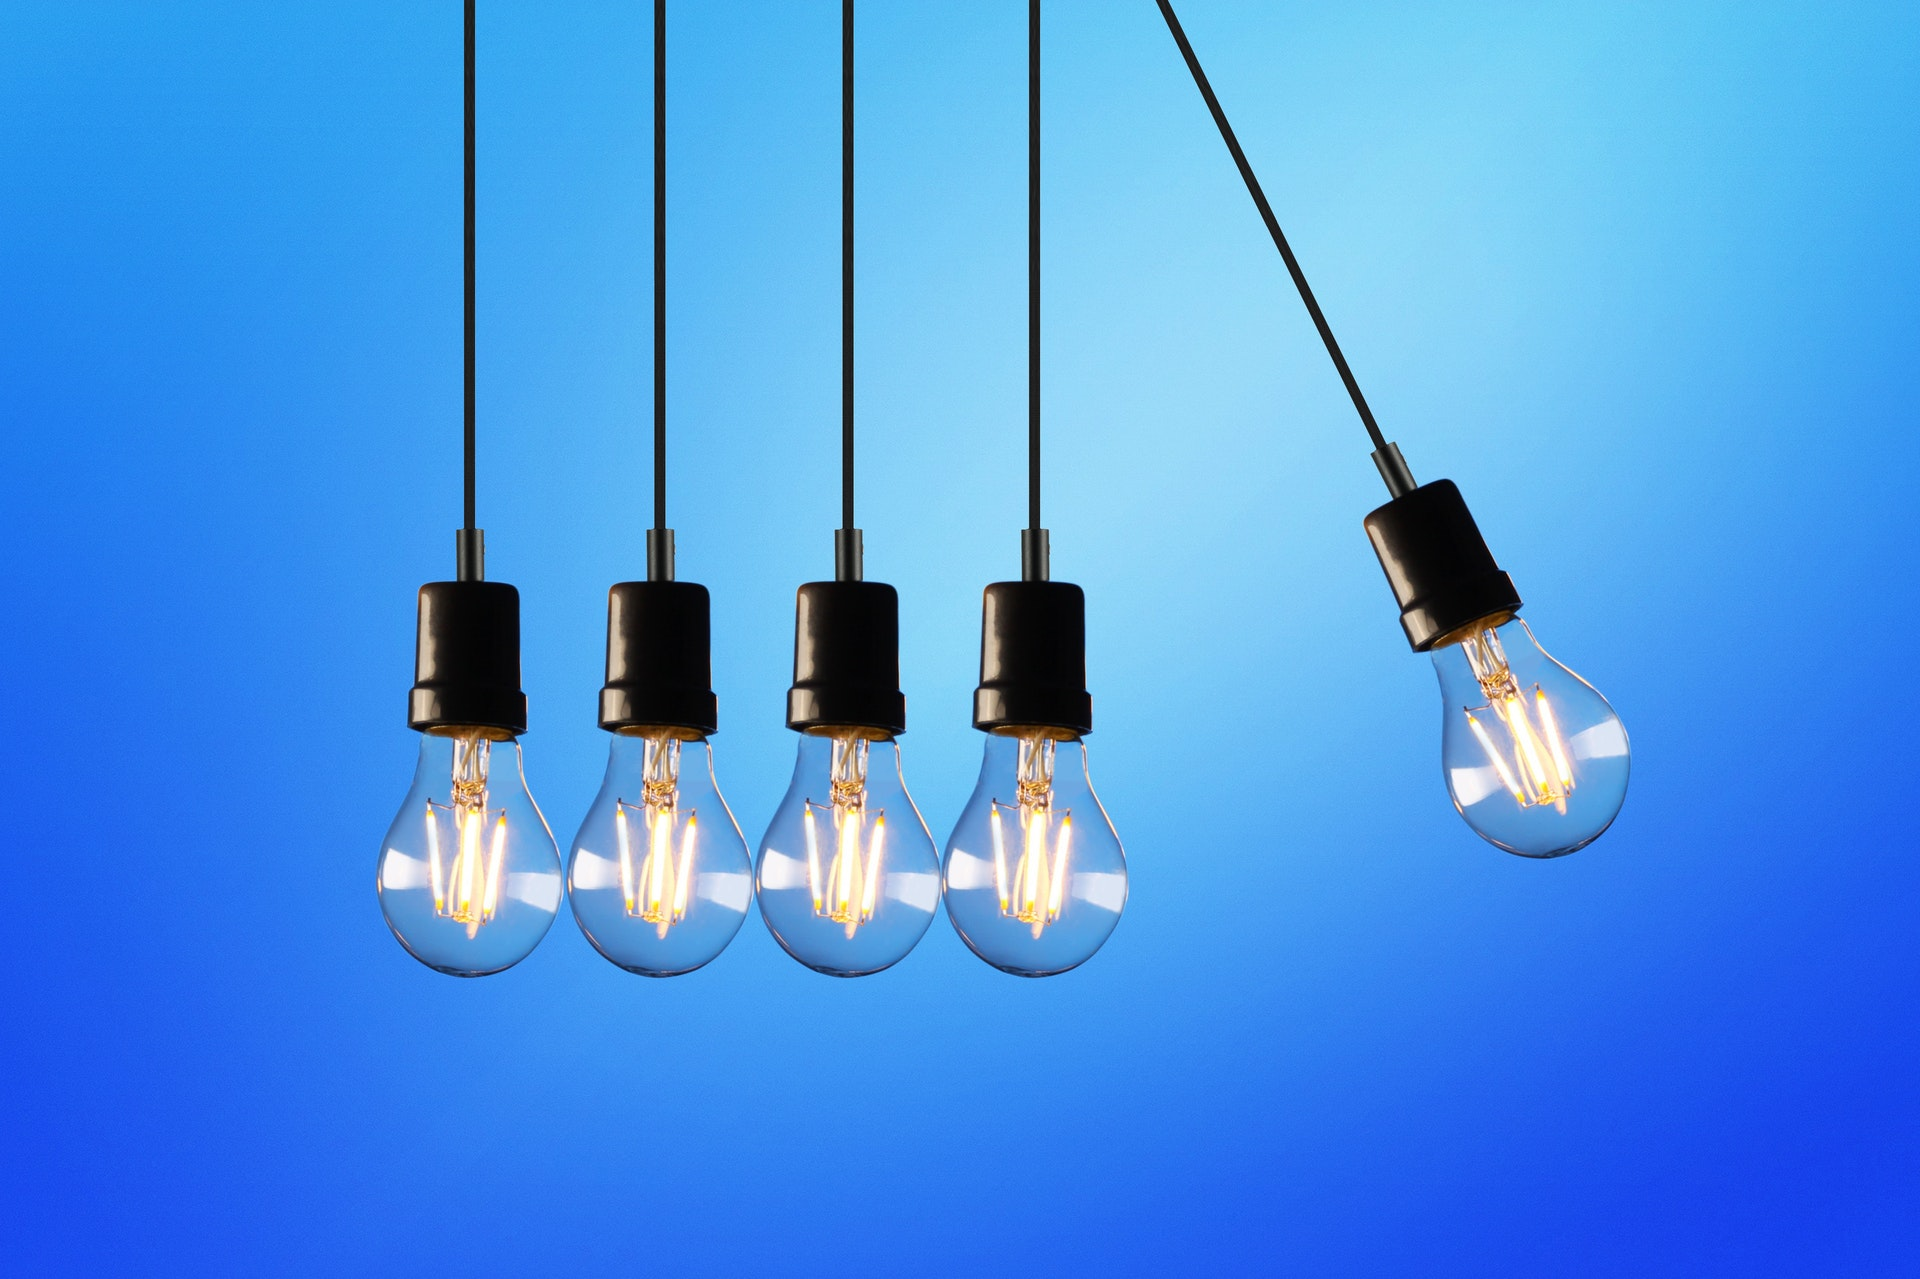 liberalizare piata energie